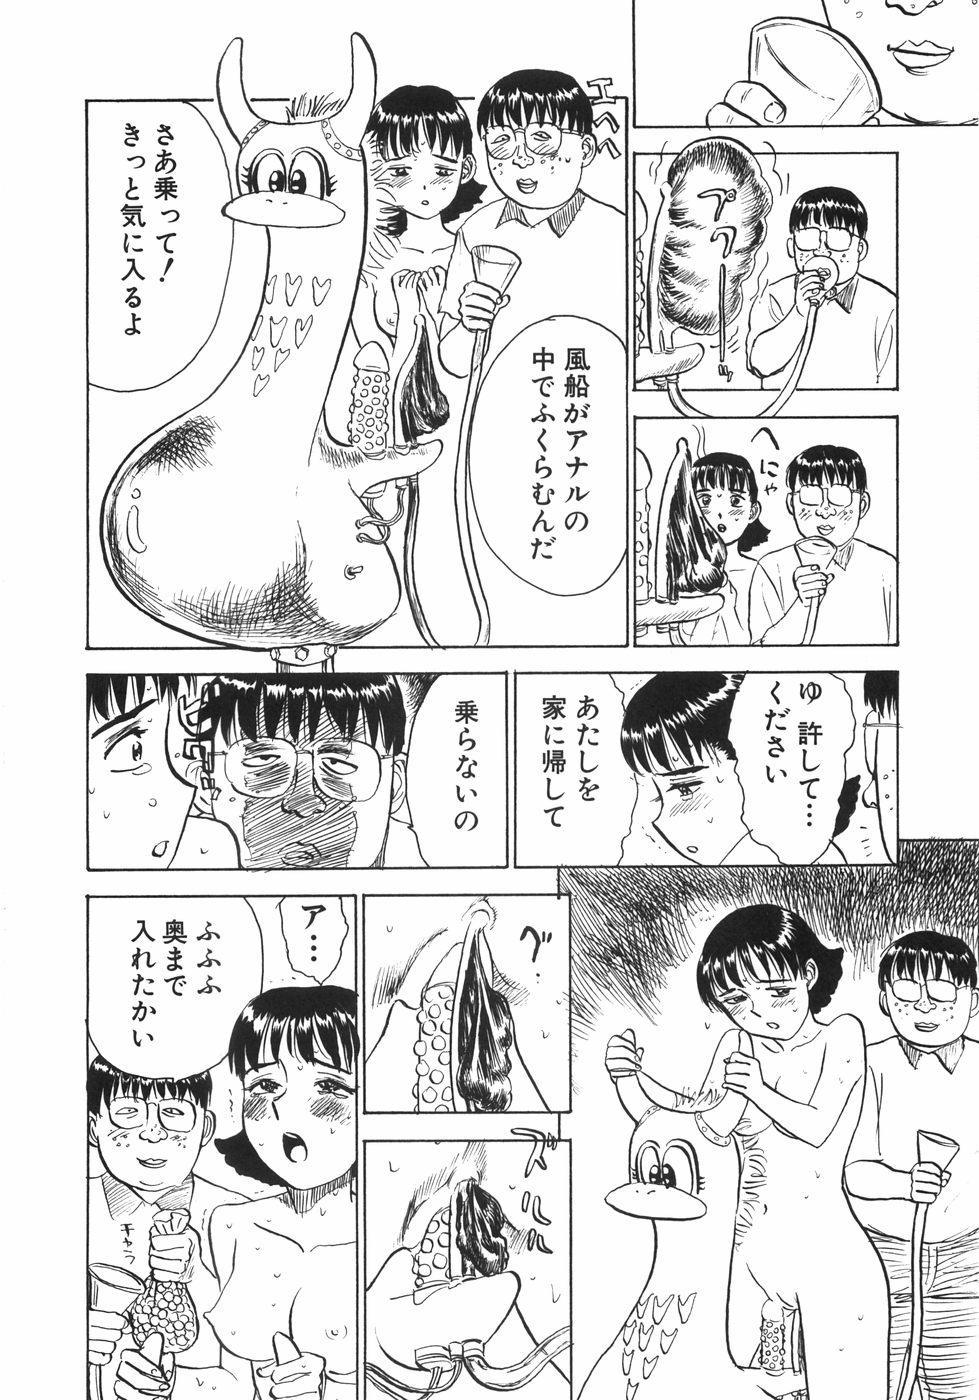 Ningyou no Yakata - The Doll House 70